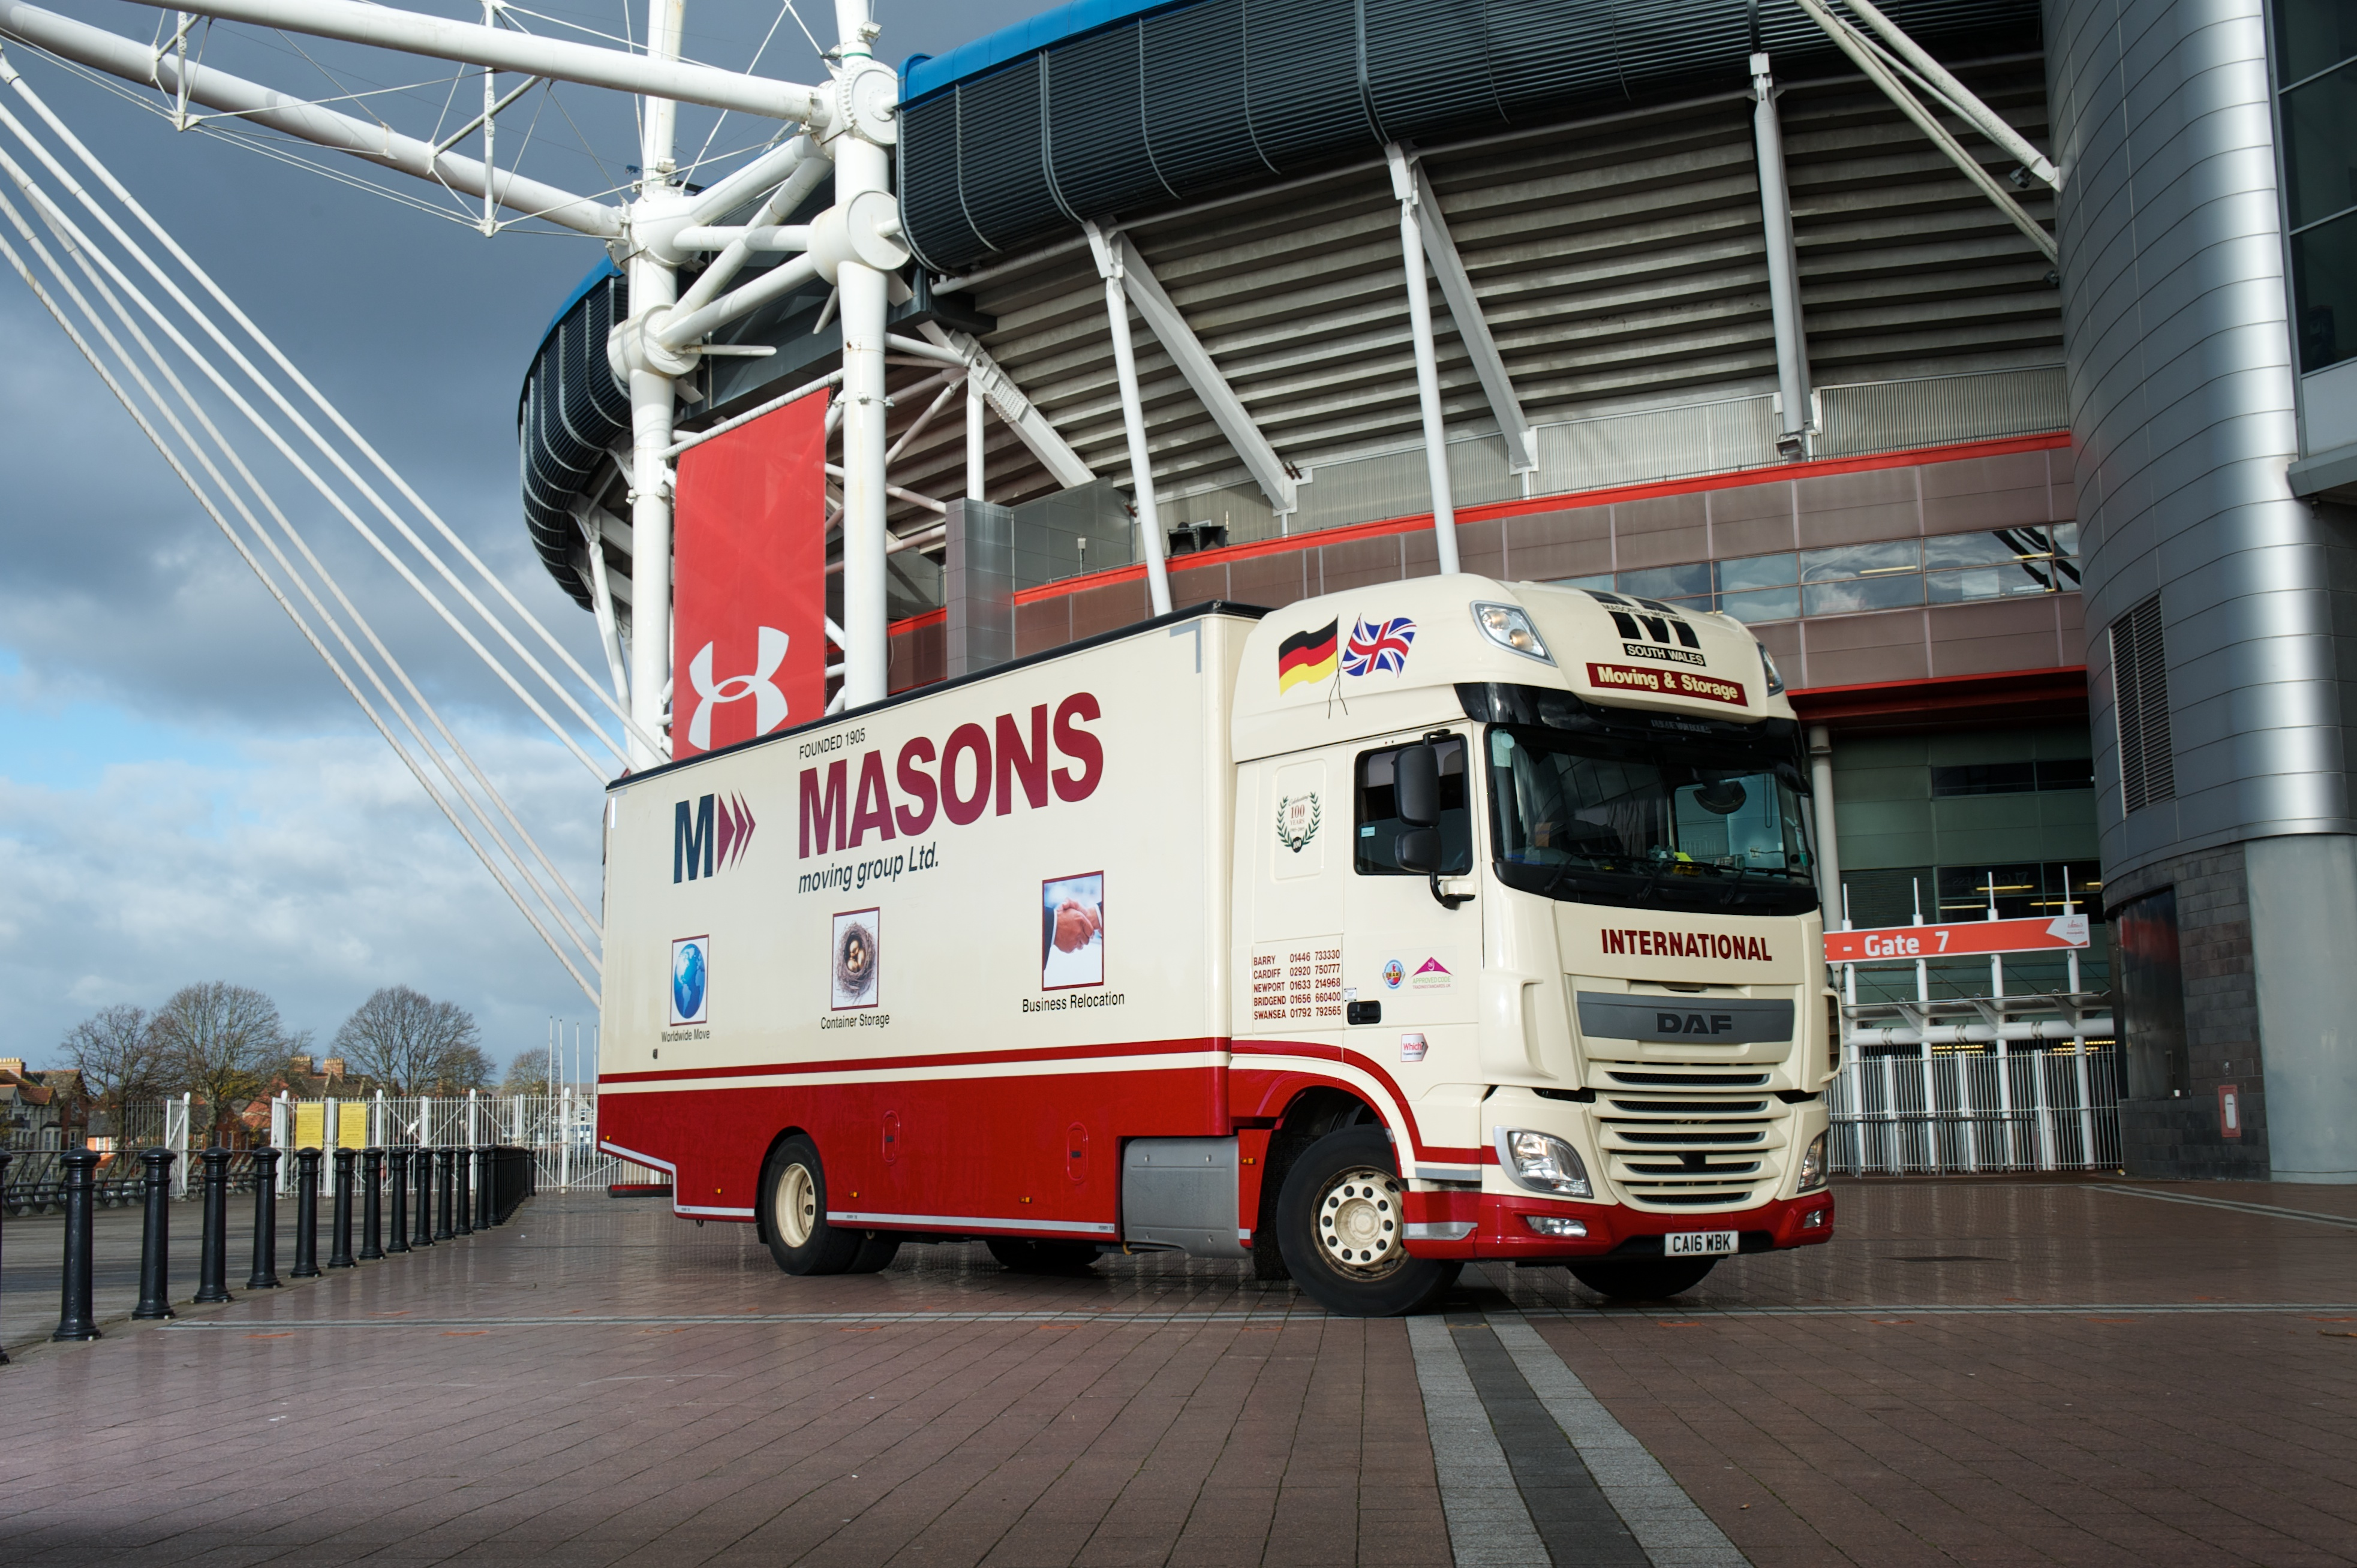 Masons Removals Cardiff van at Cardiff Principality Stadium